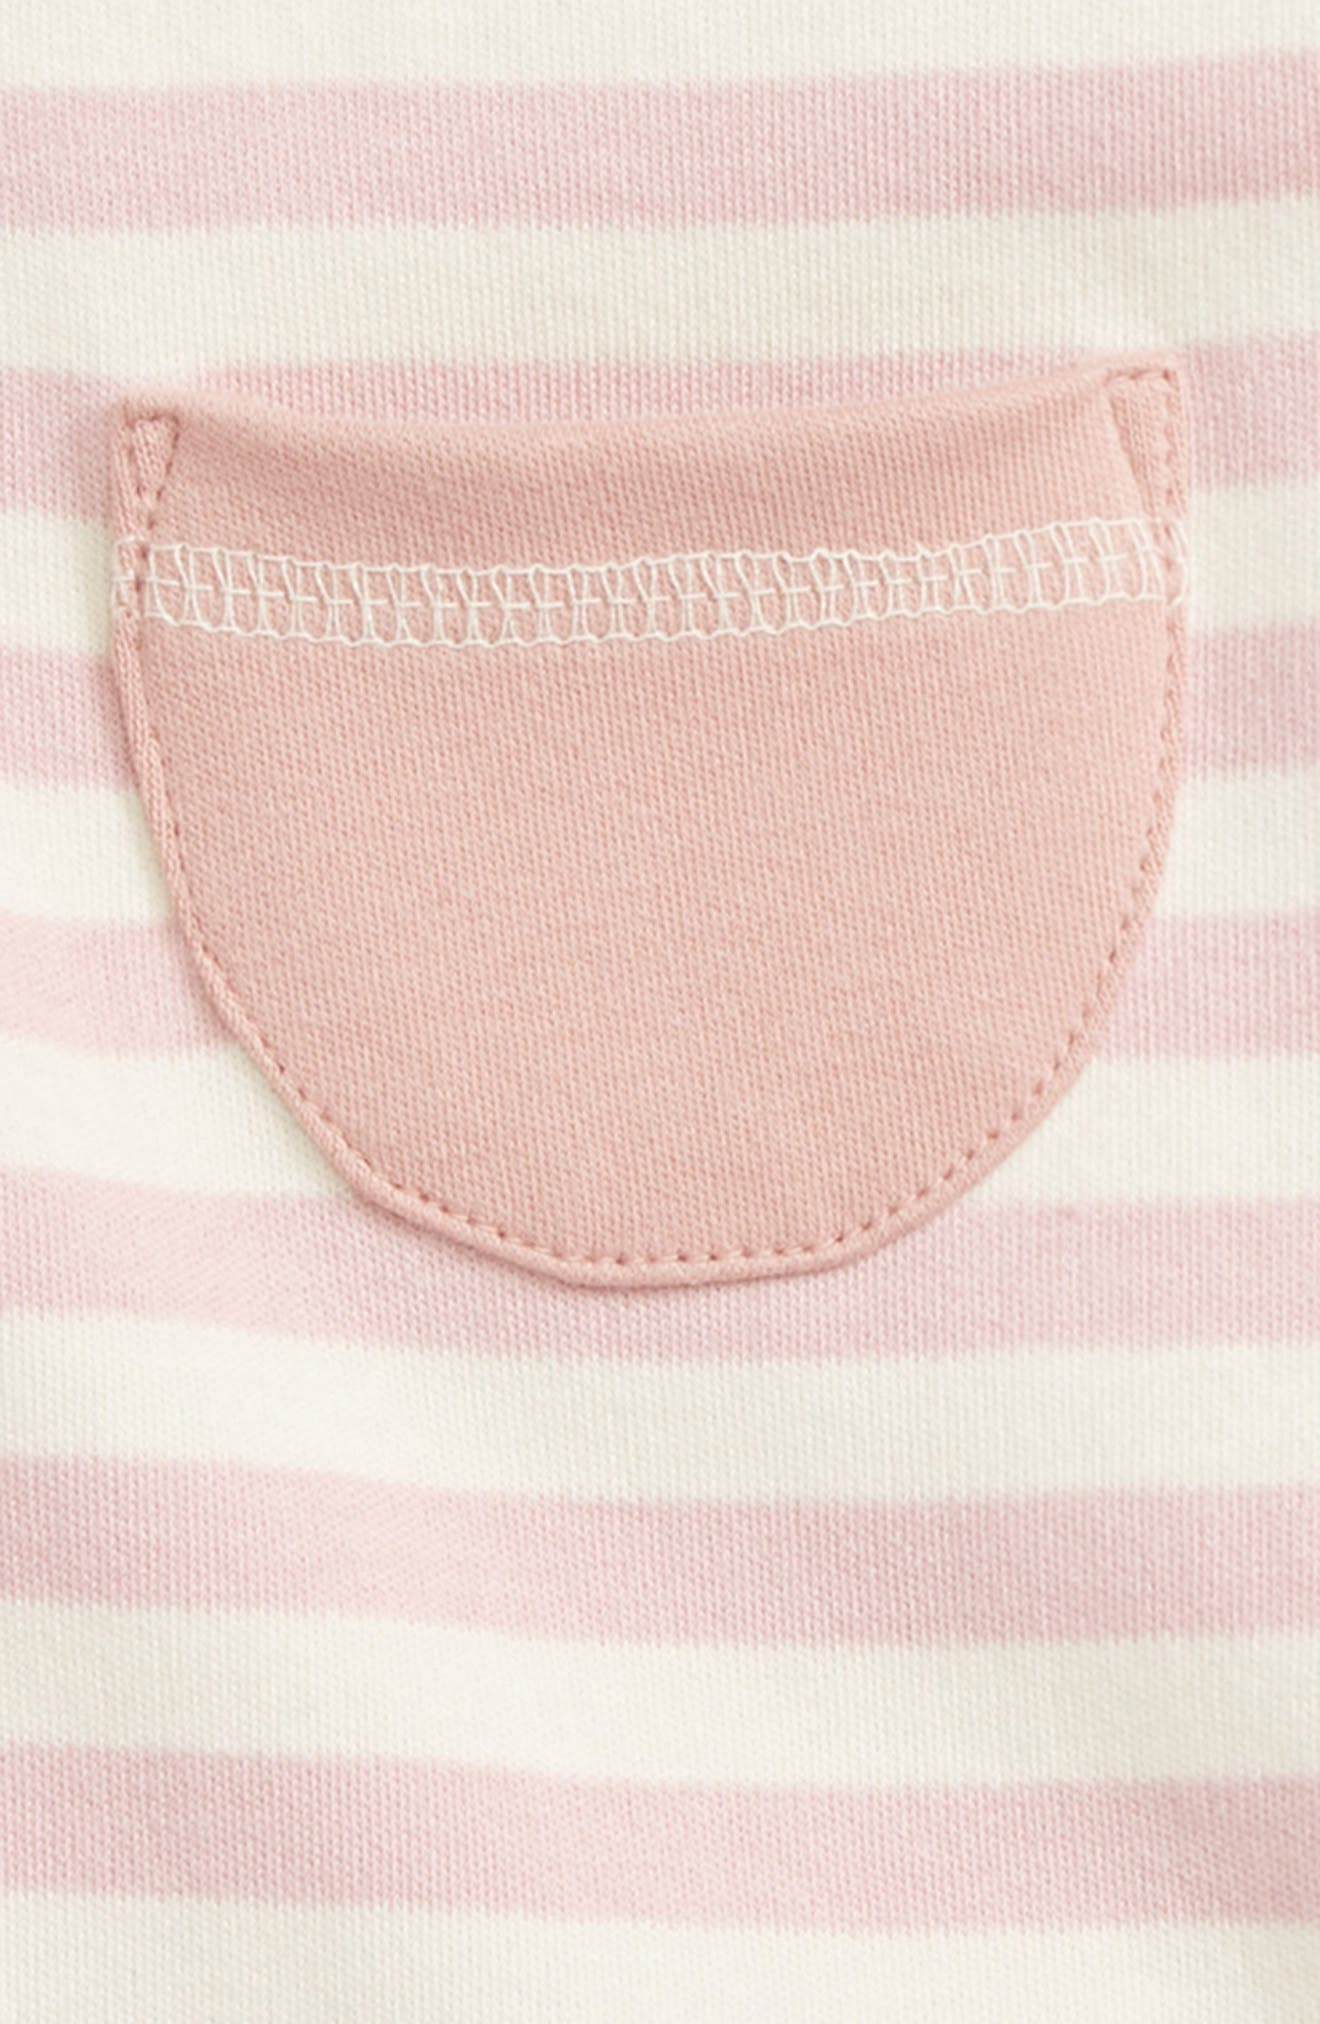 Stripe Organic Cotton Harem Romper,                             Alternate thumbnail 2, color,                             Mauve/ Beige